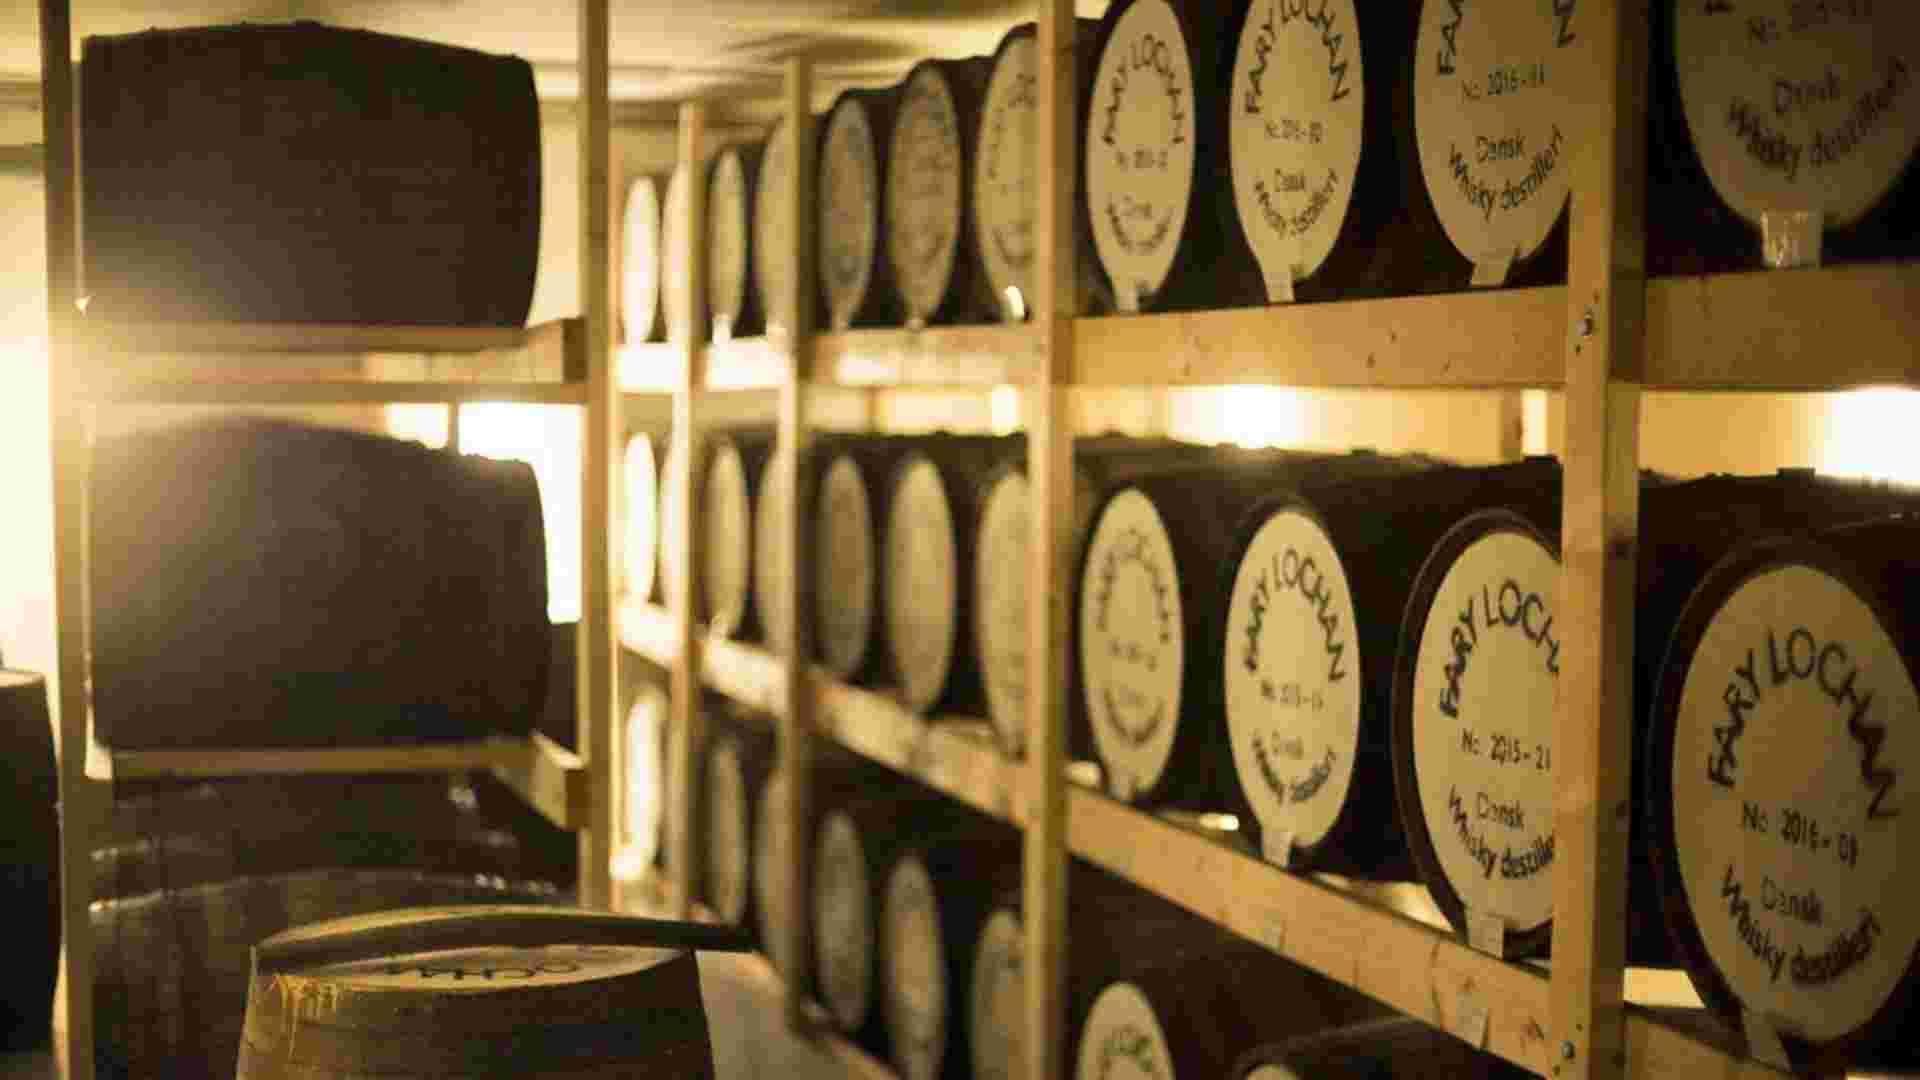 Fary Lochan Destilleri A/S